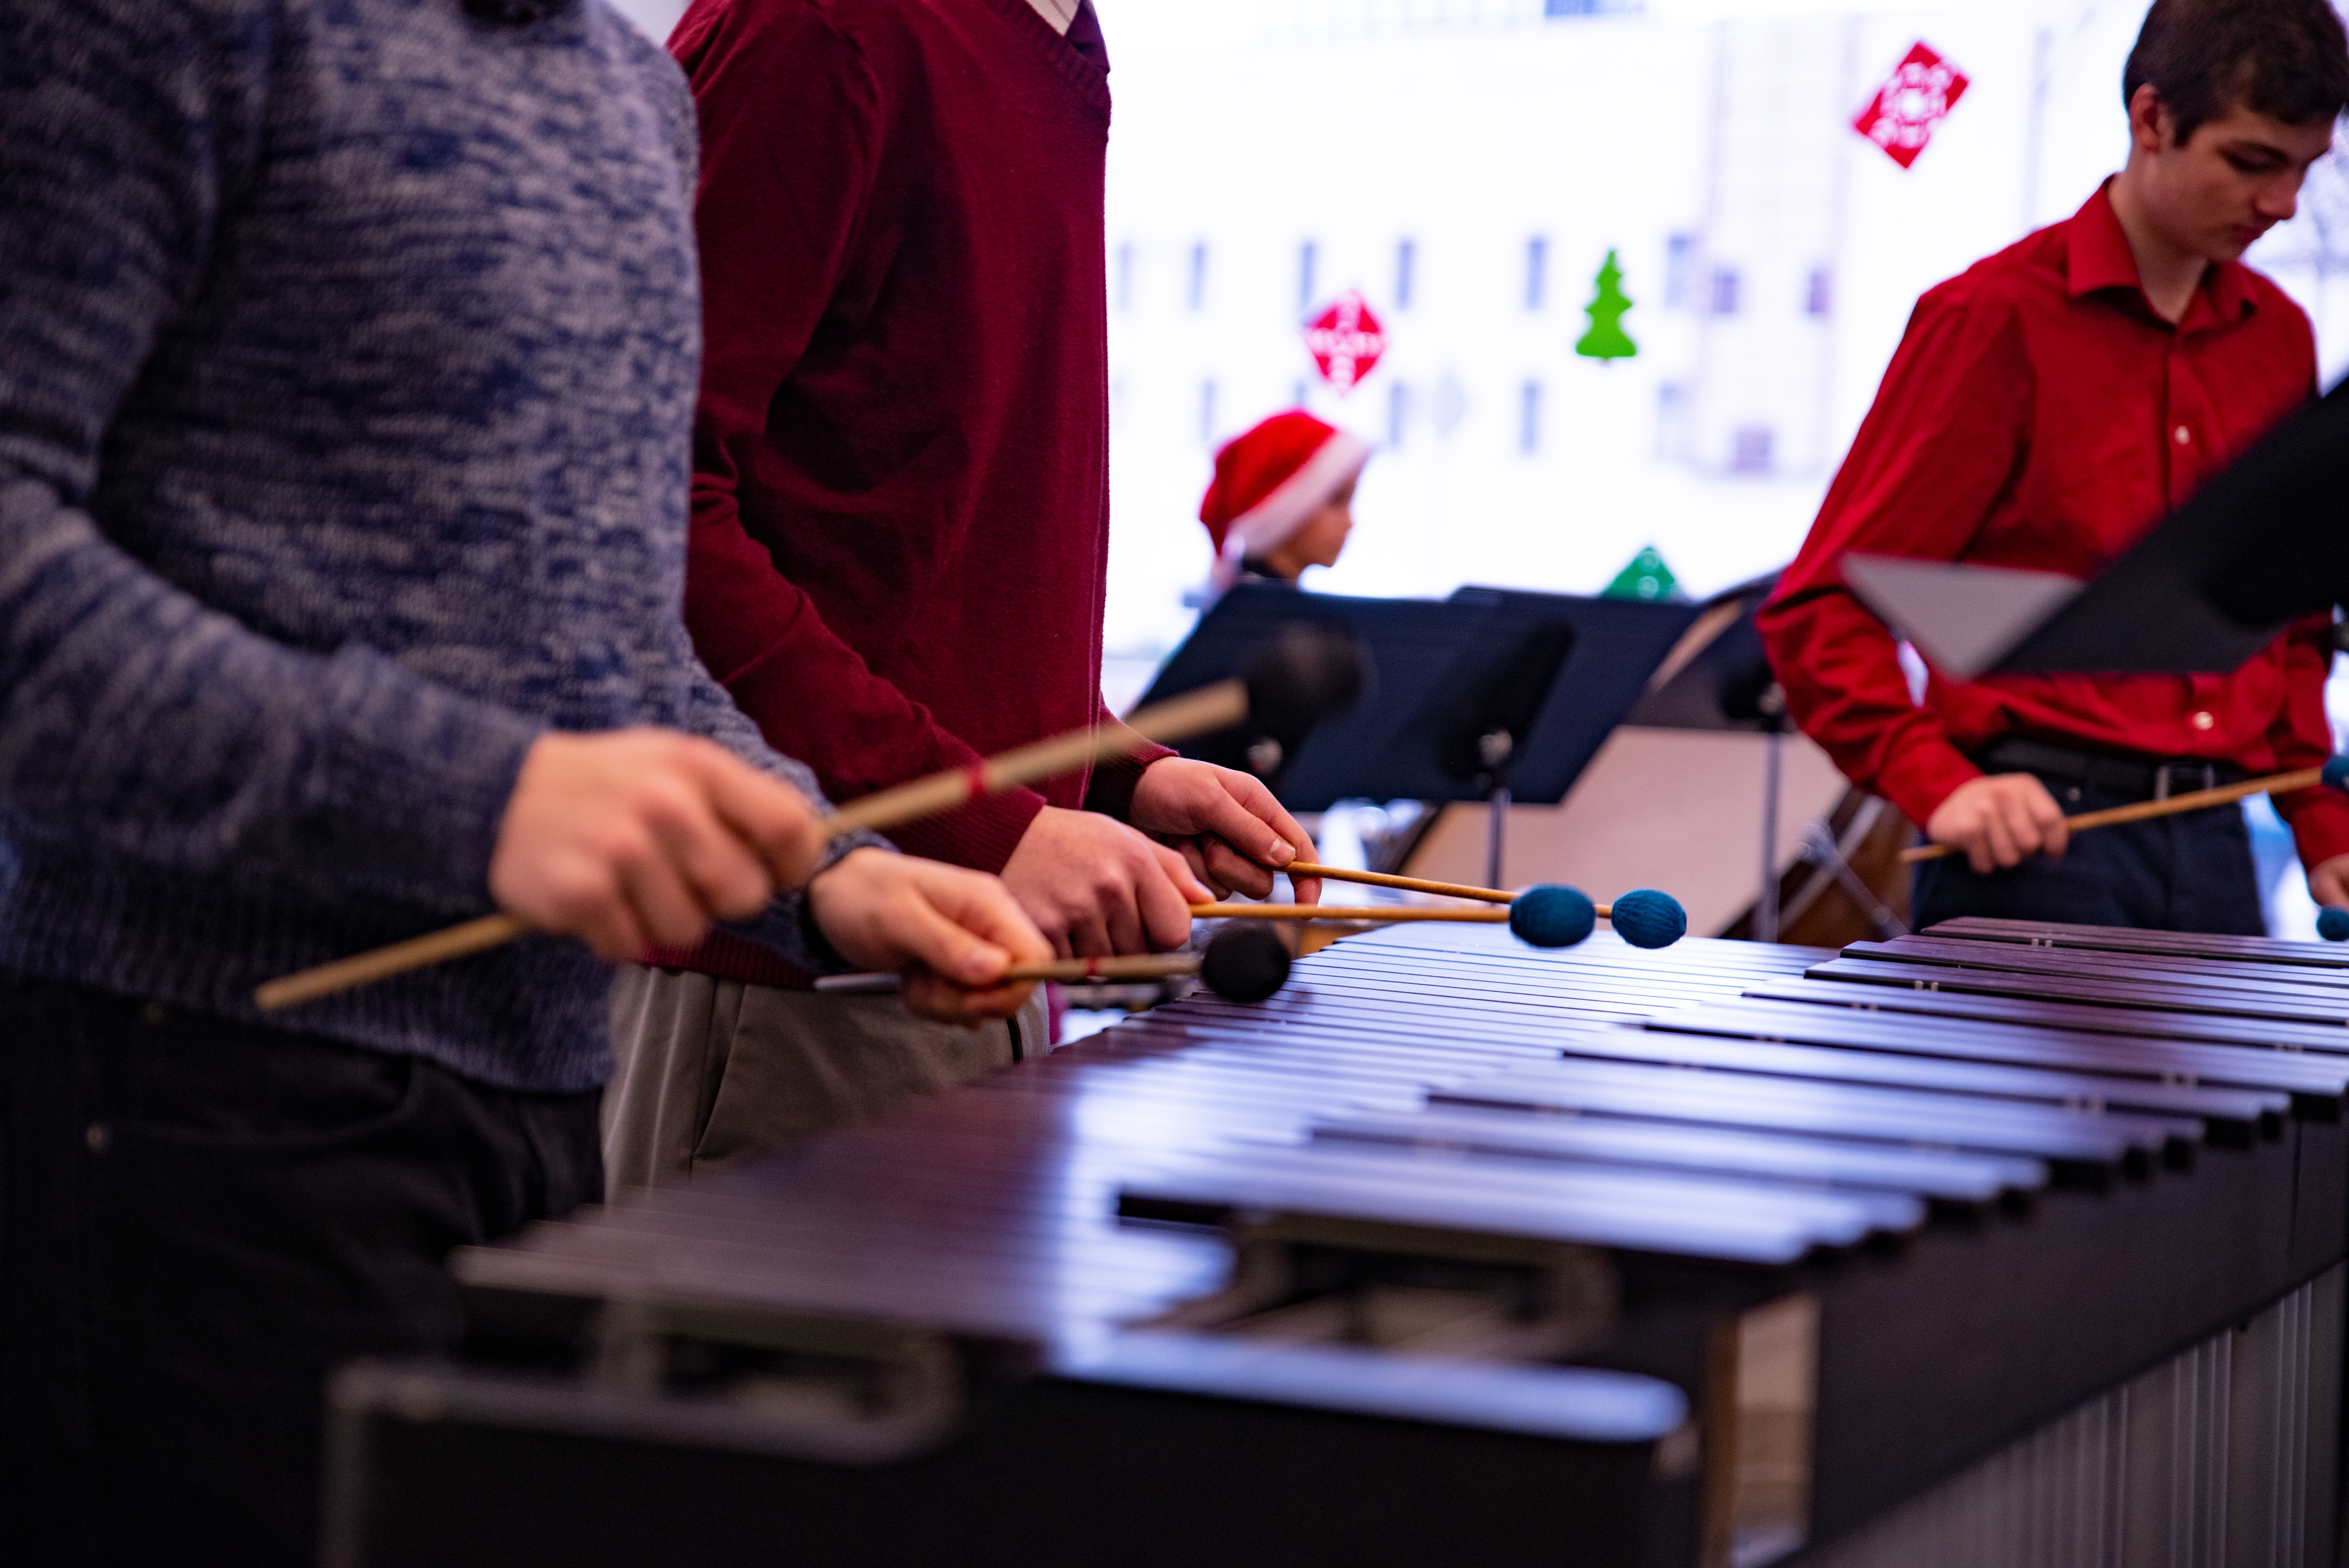 2018-12-15_ECMS_Winterfest_PercussionEns_MM_2638